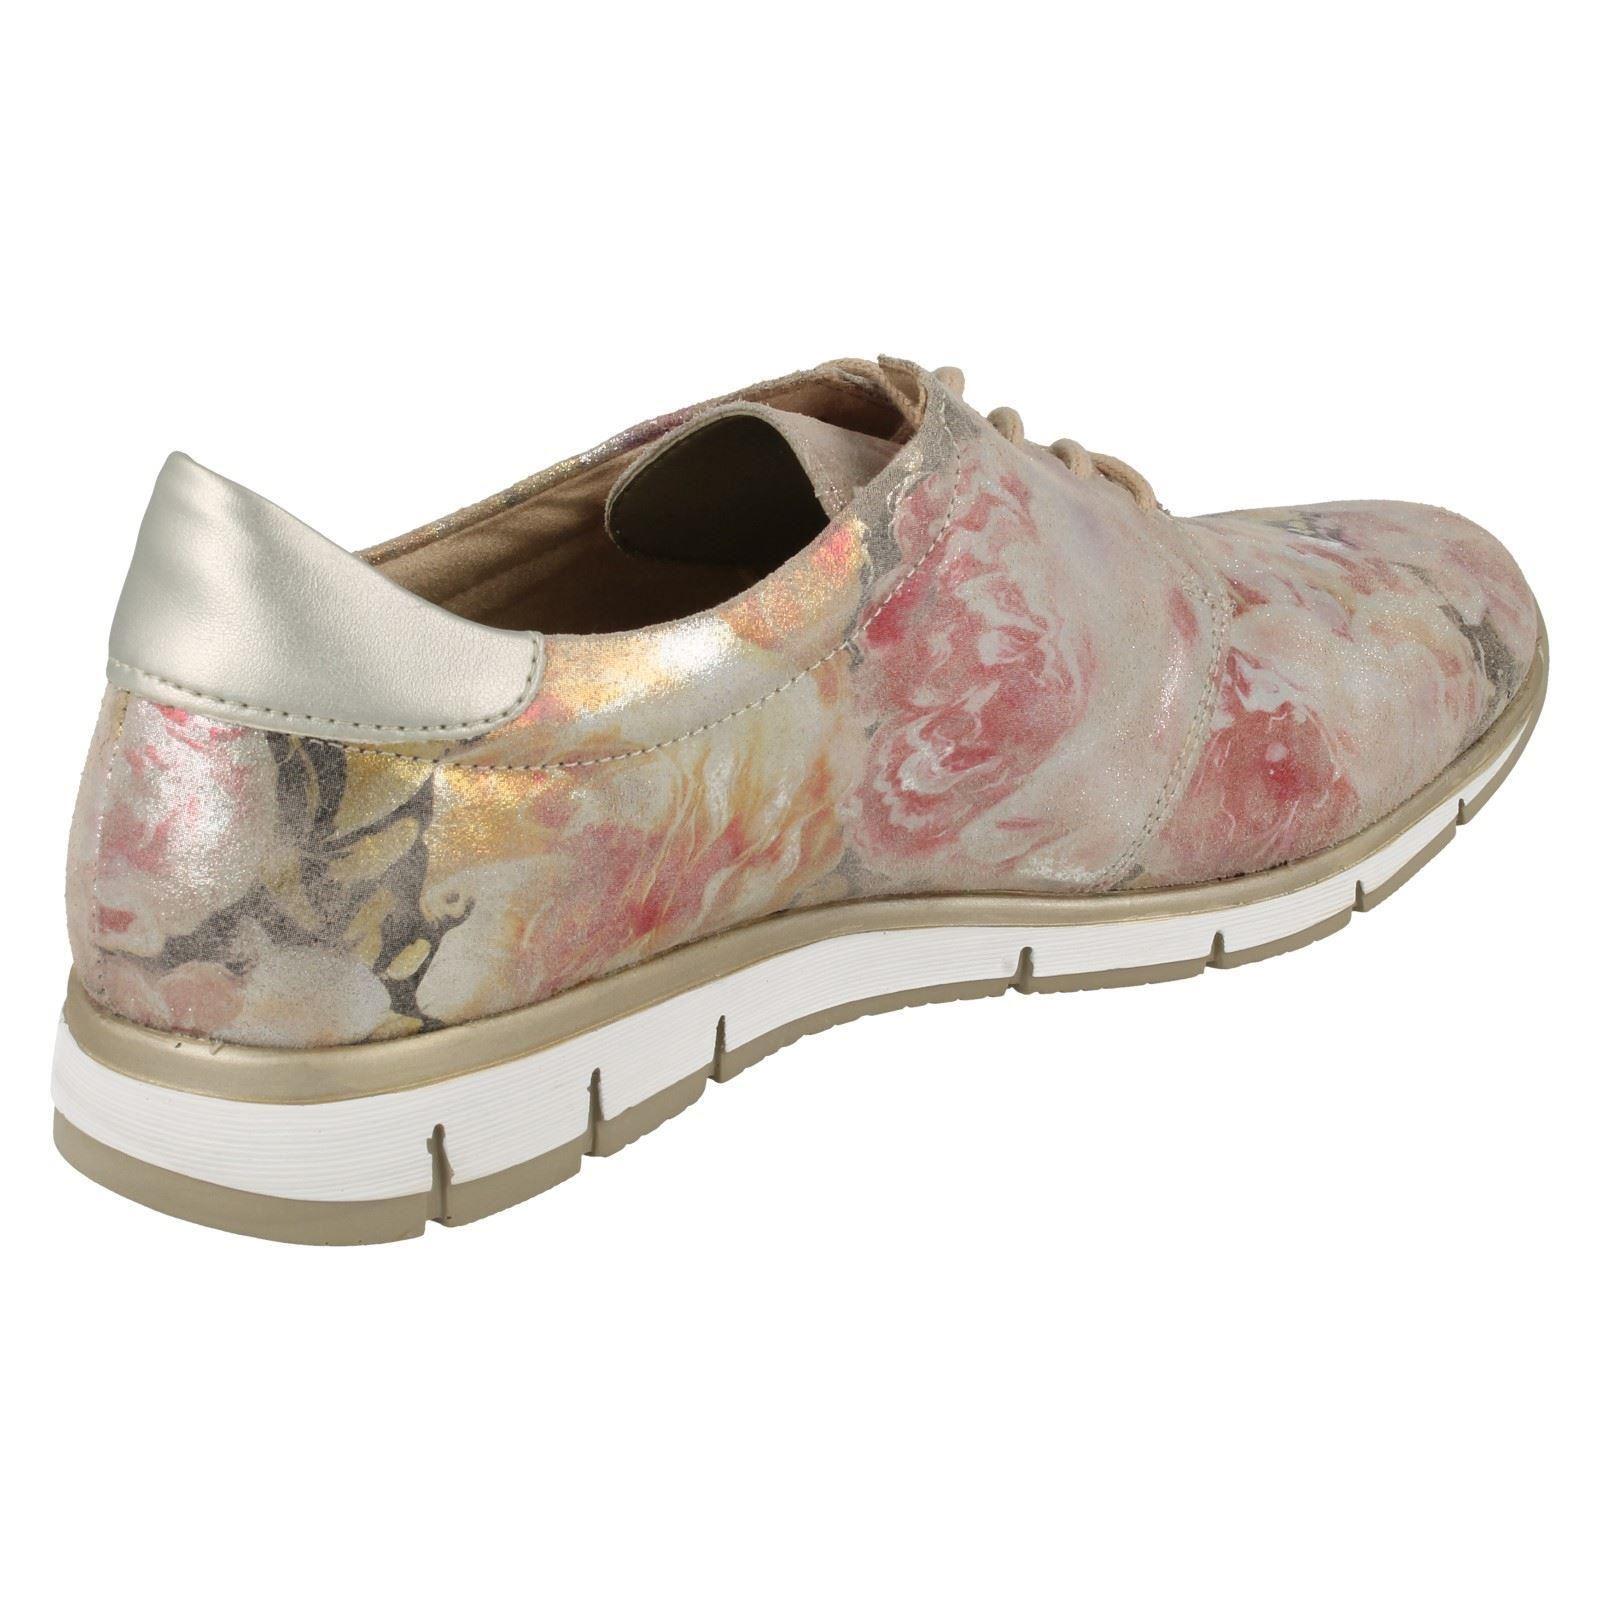 femmes pour Remonte Chaussures Casual 'r4010' gwzzaqxv